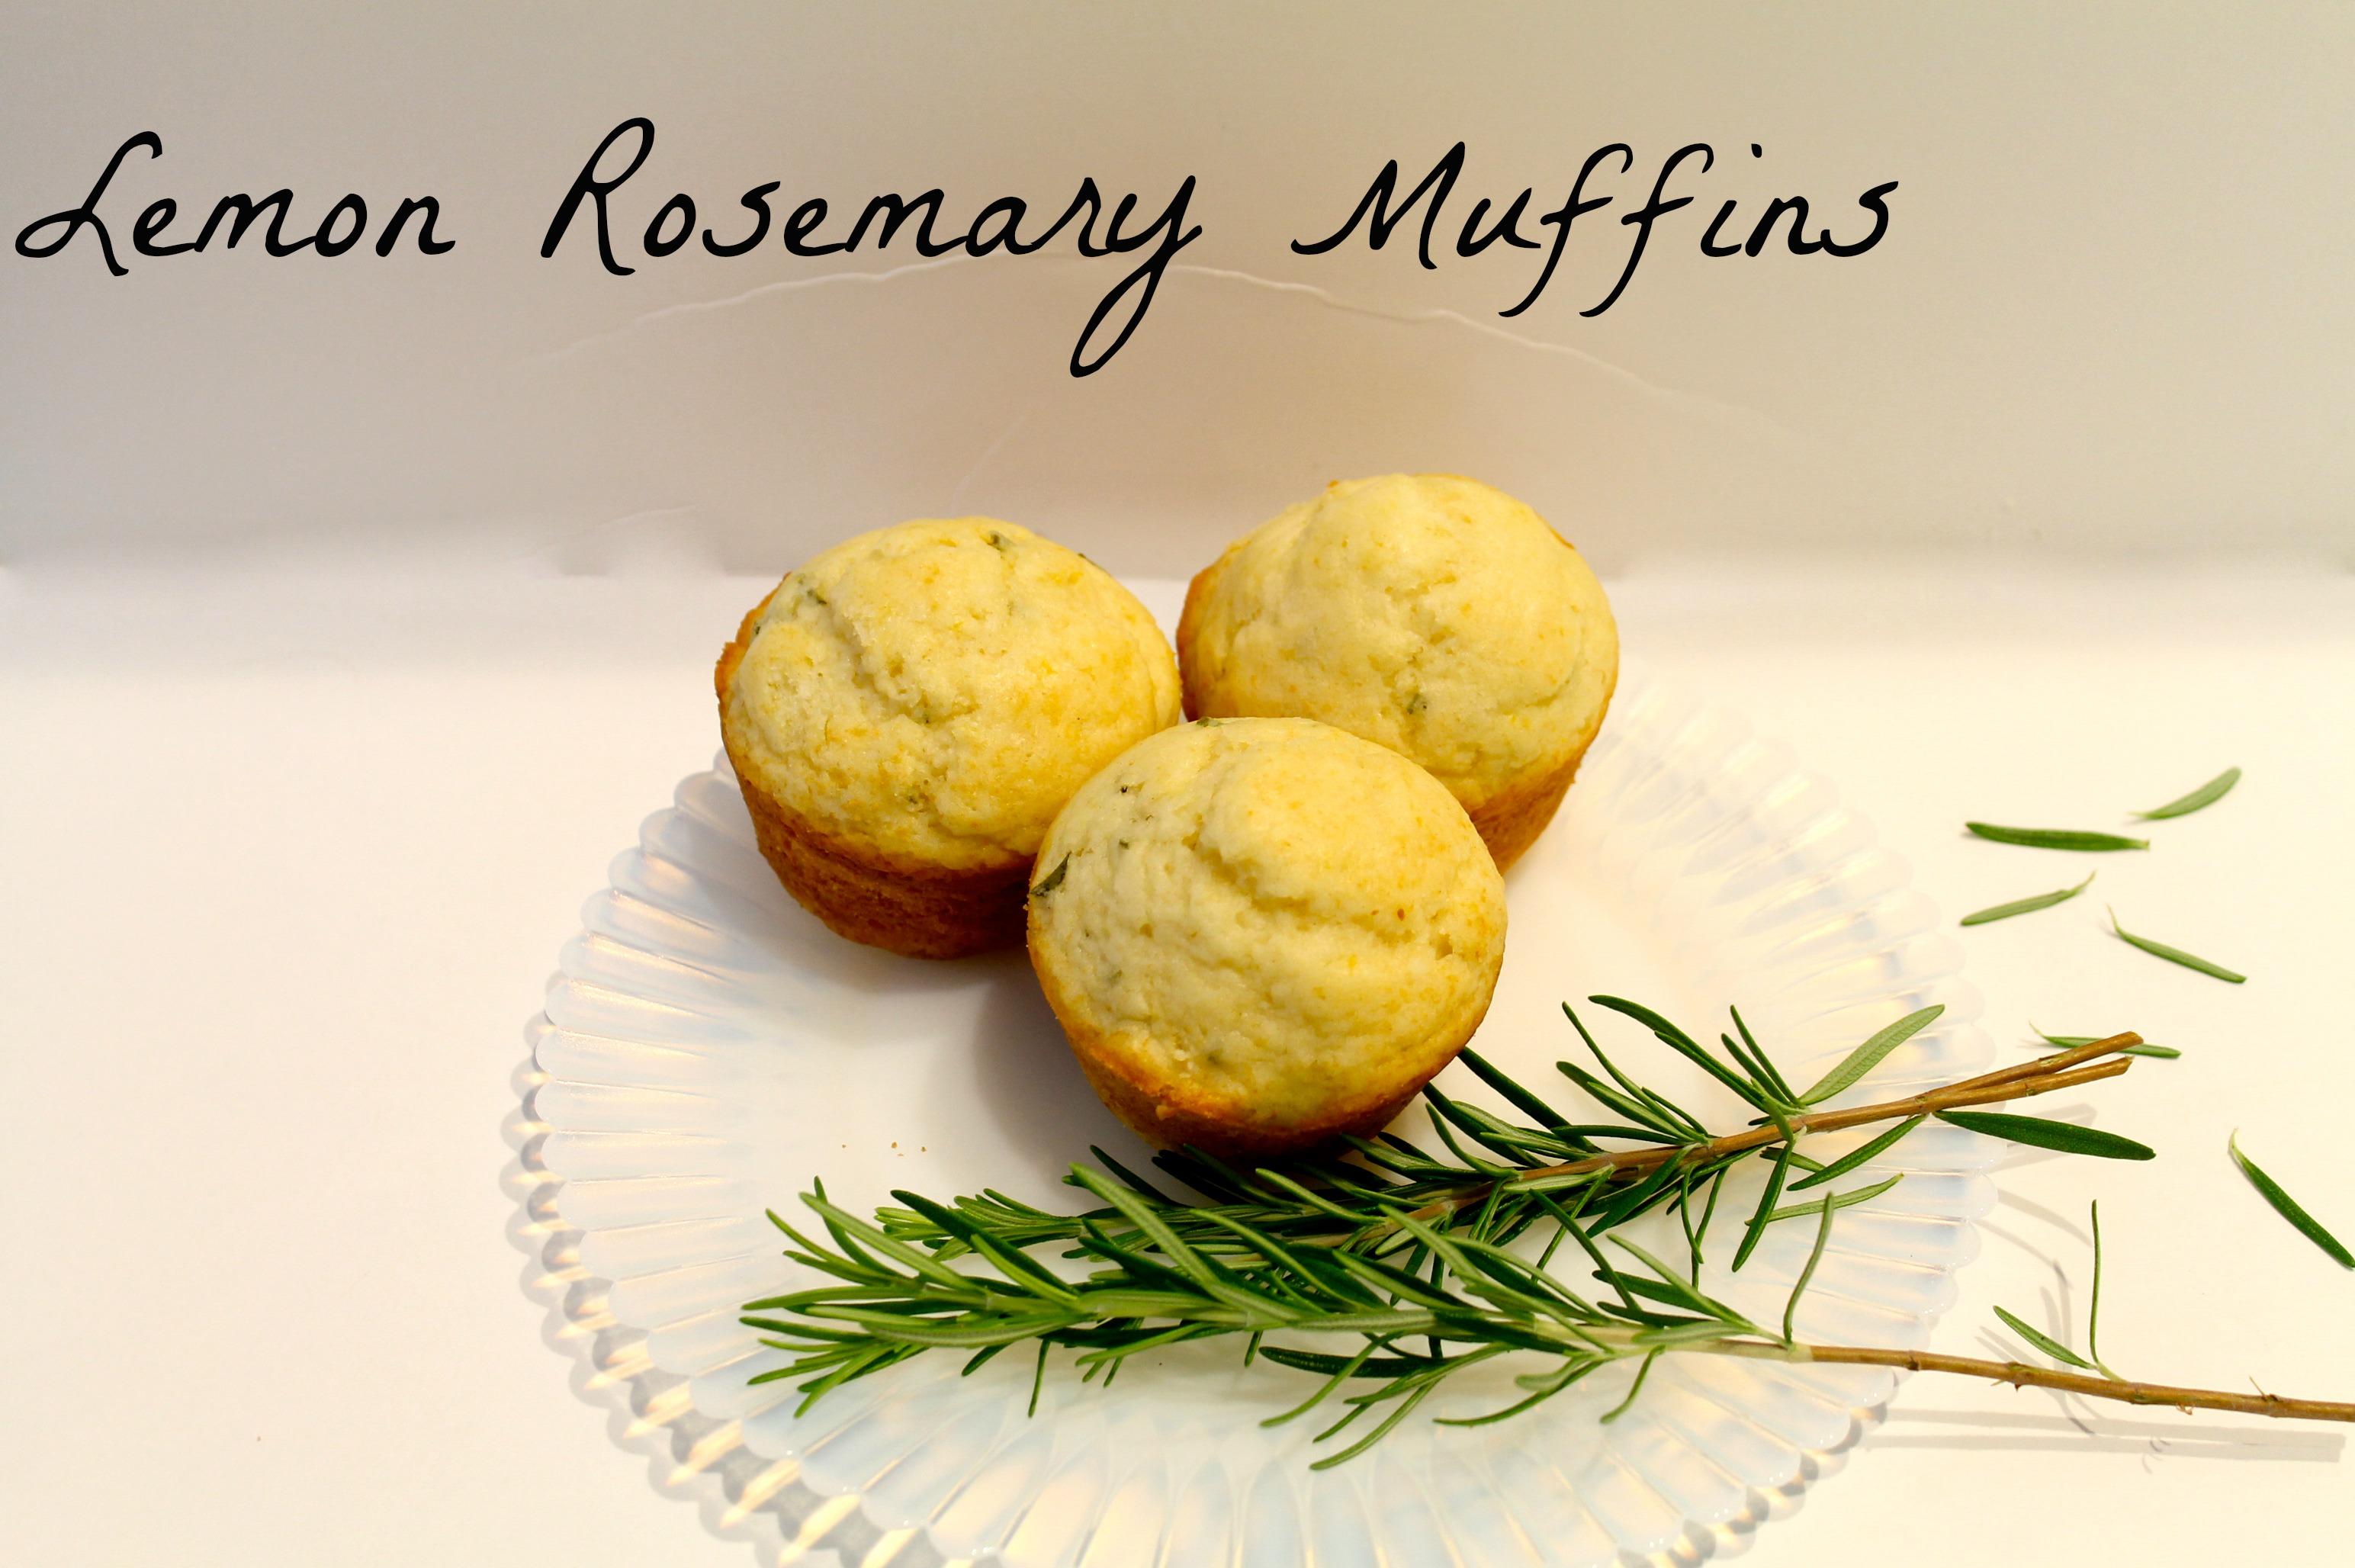 Lemon Muffins - Tailgating Recipe - Lemon/Rosemary Muffins